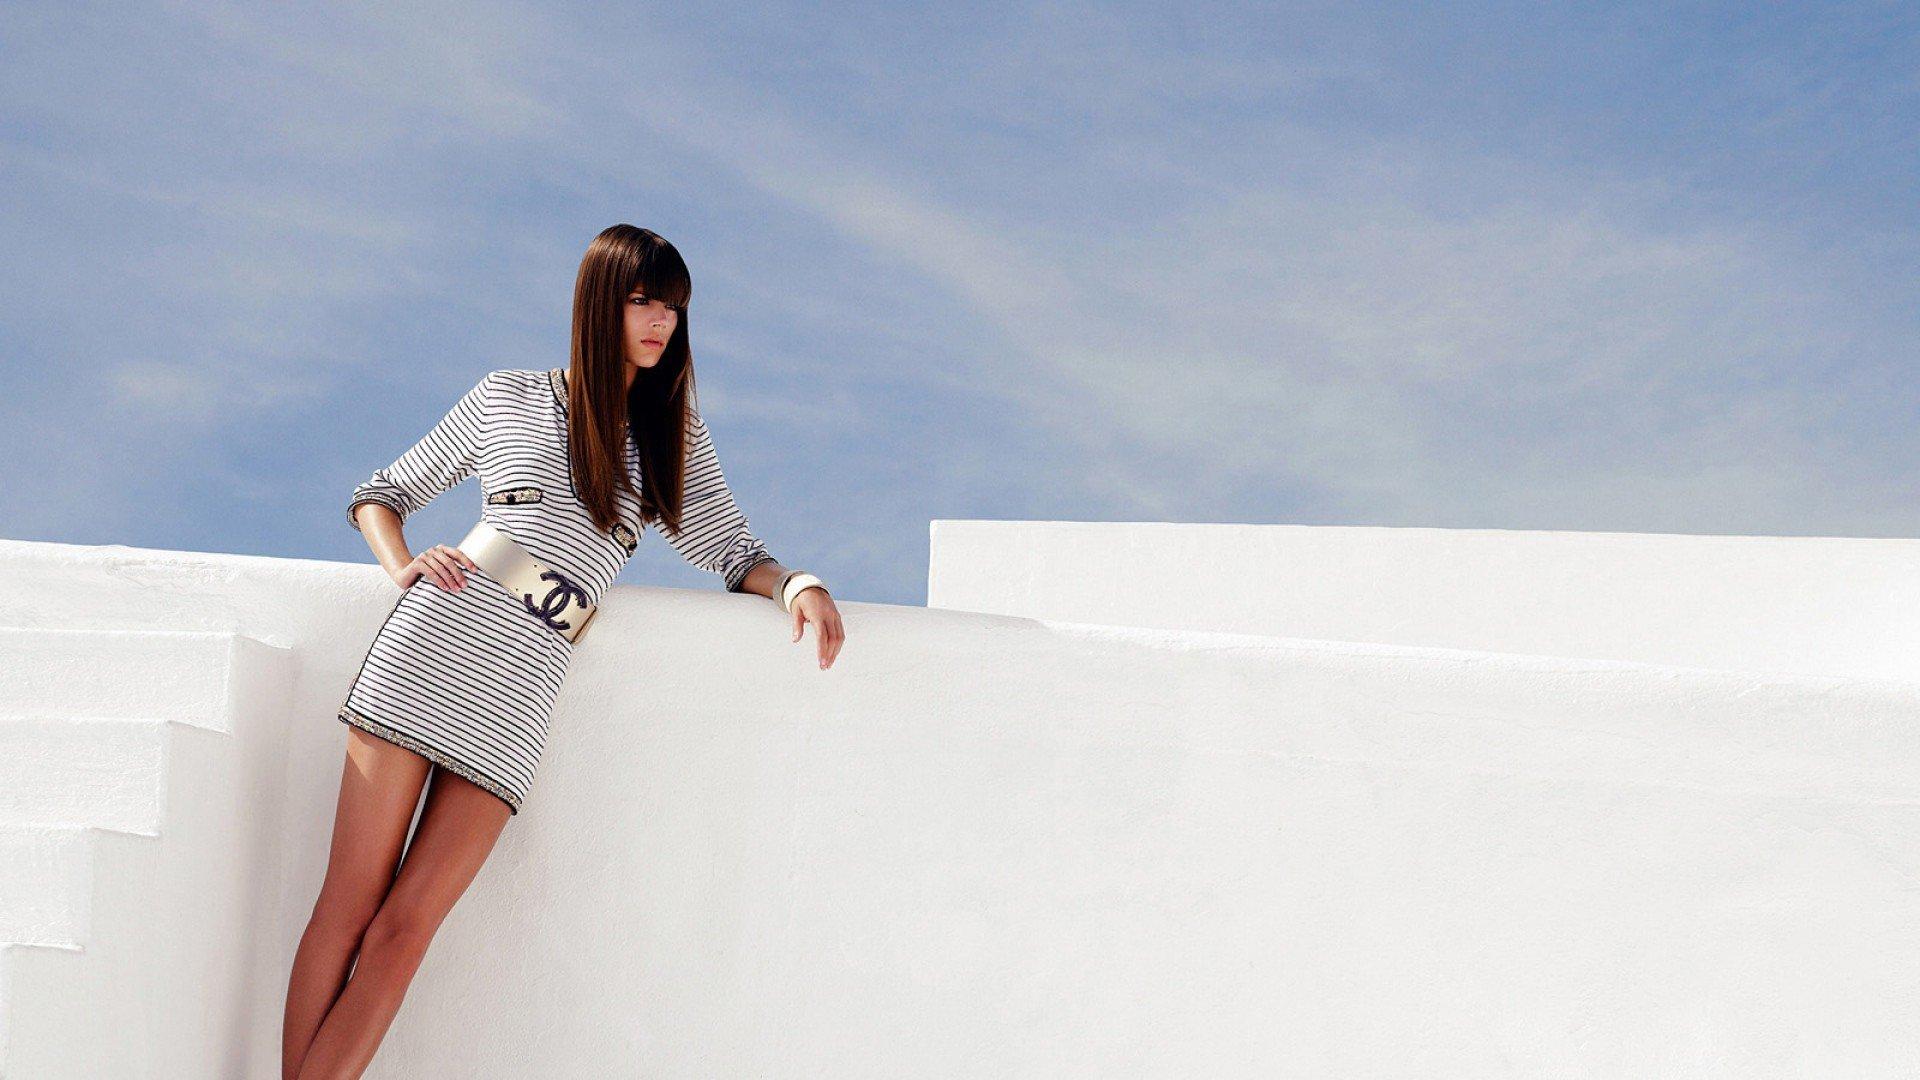 Chanel Celaya, HD Celebrities, 4k Wallpapers, Images